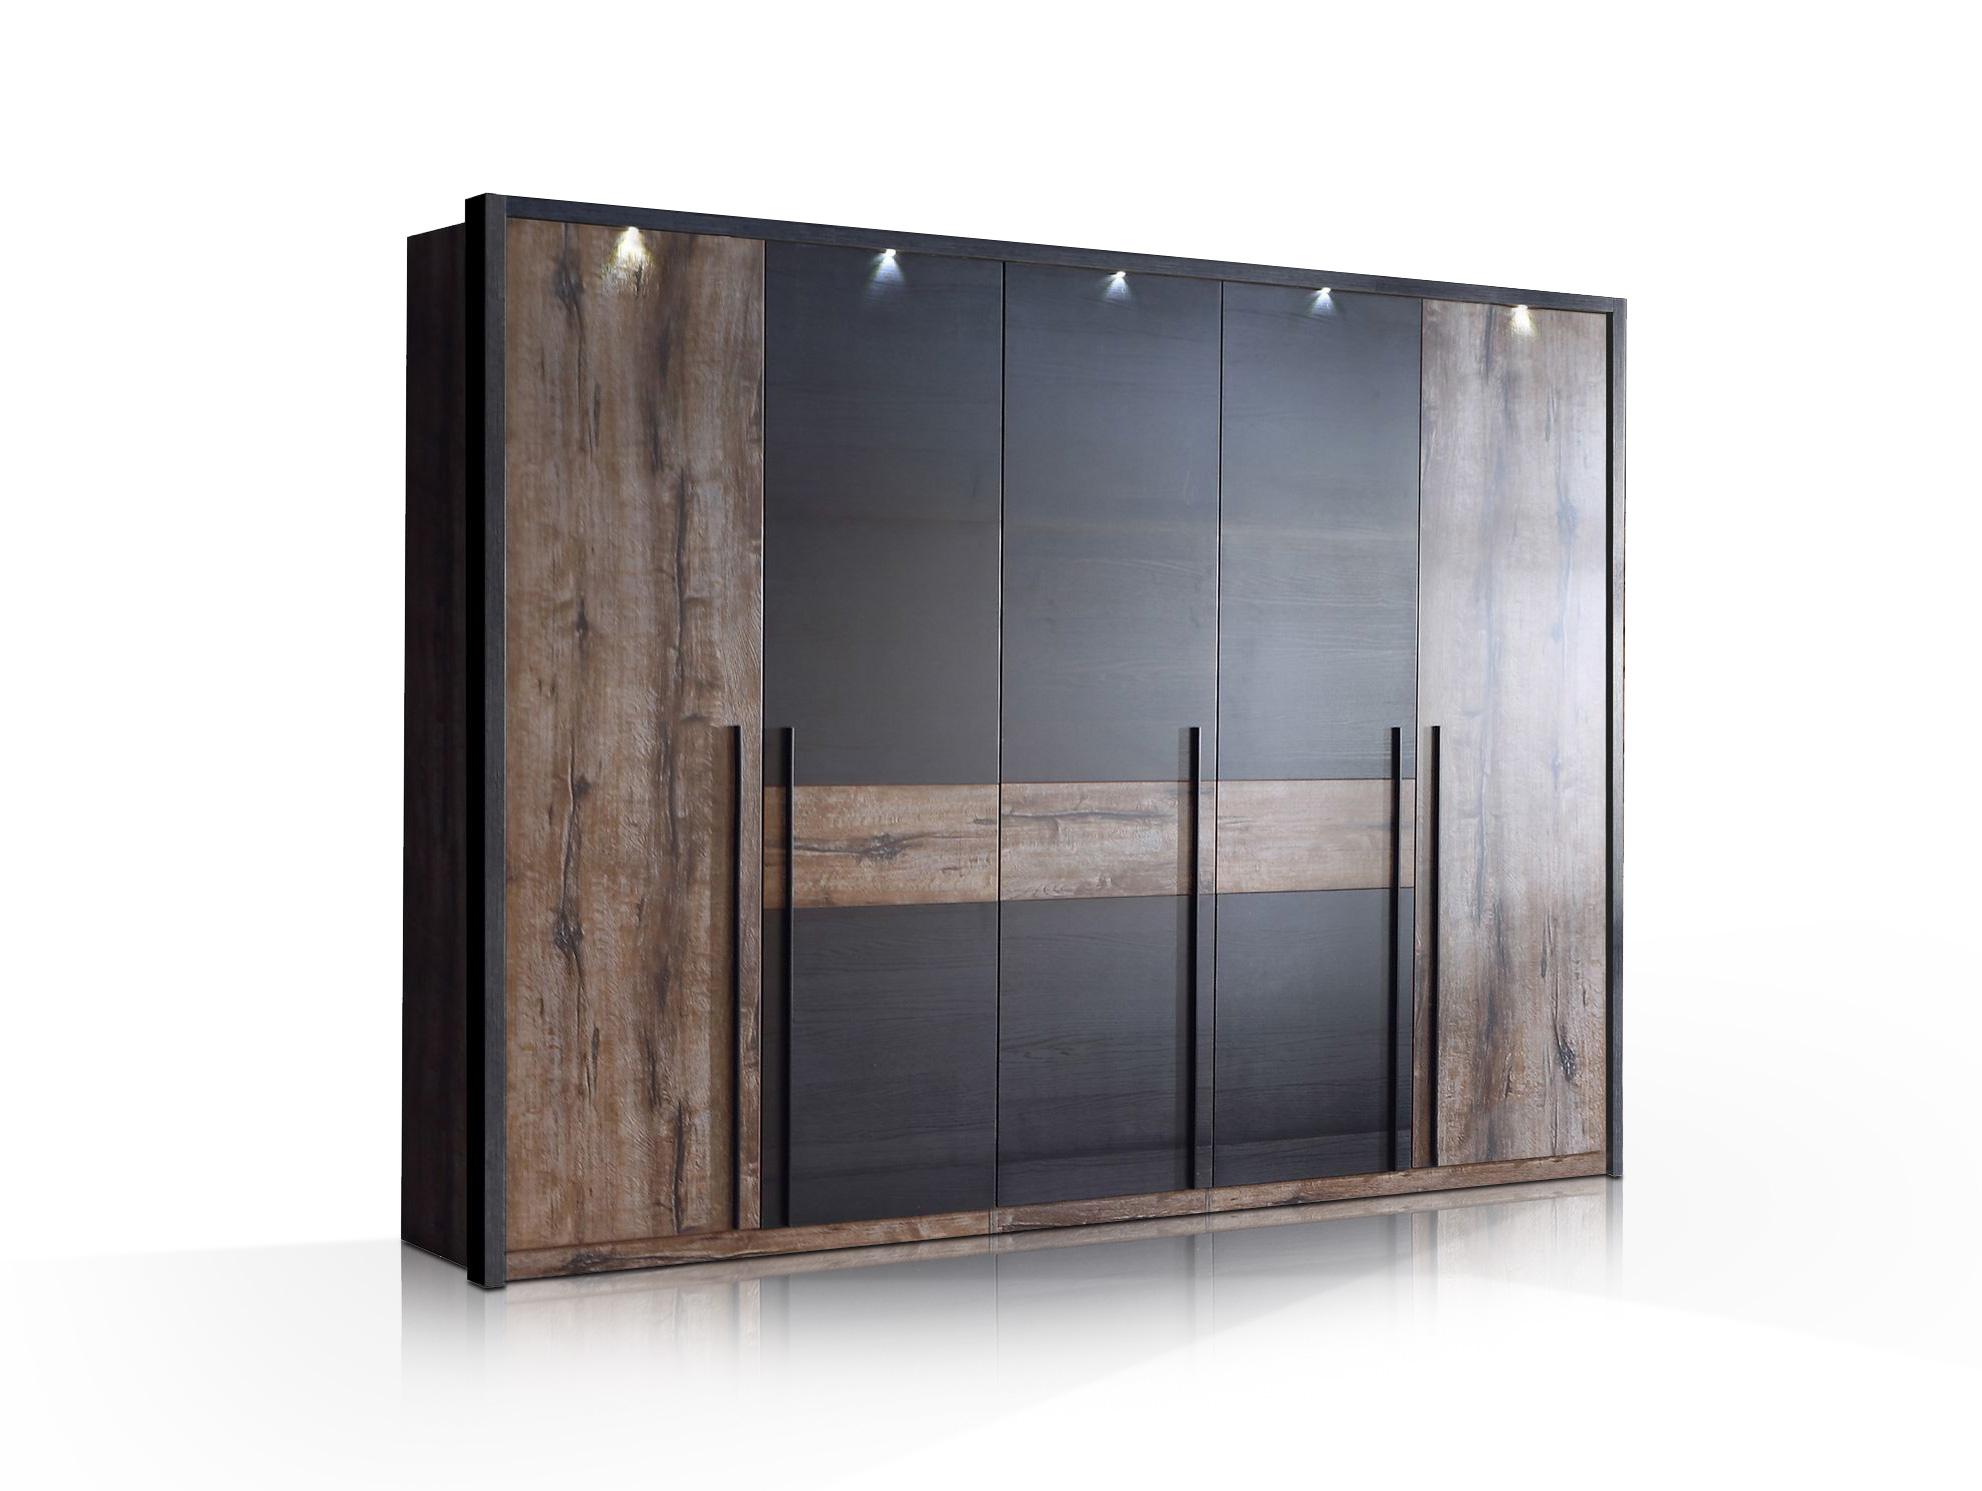 schrank nach ma berlin best hochbett ikea gebraucht berlin schrank mnchen schrank nach ma koebe. Black Bedroom Furniture Sets. Home Design Ideas